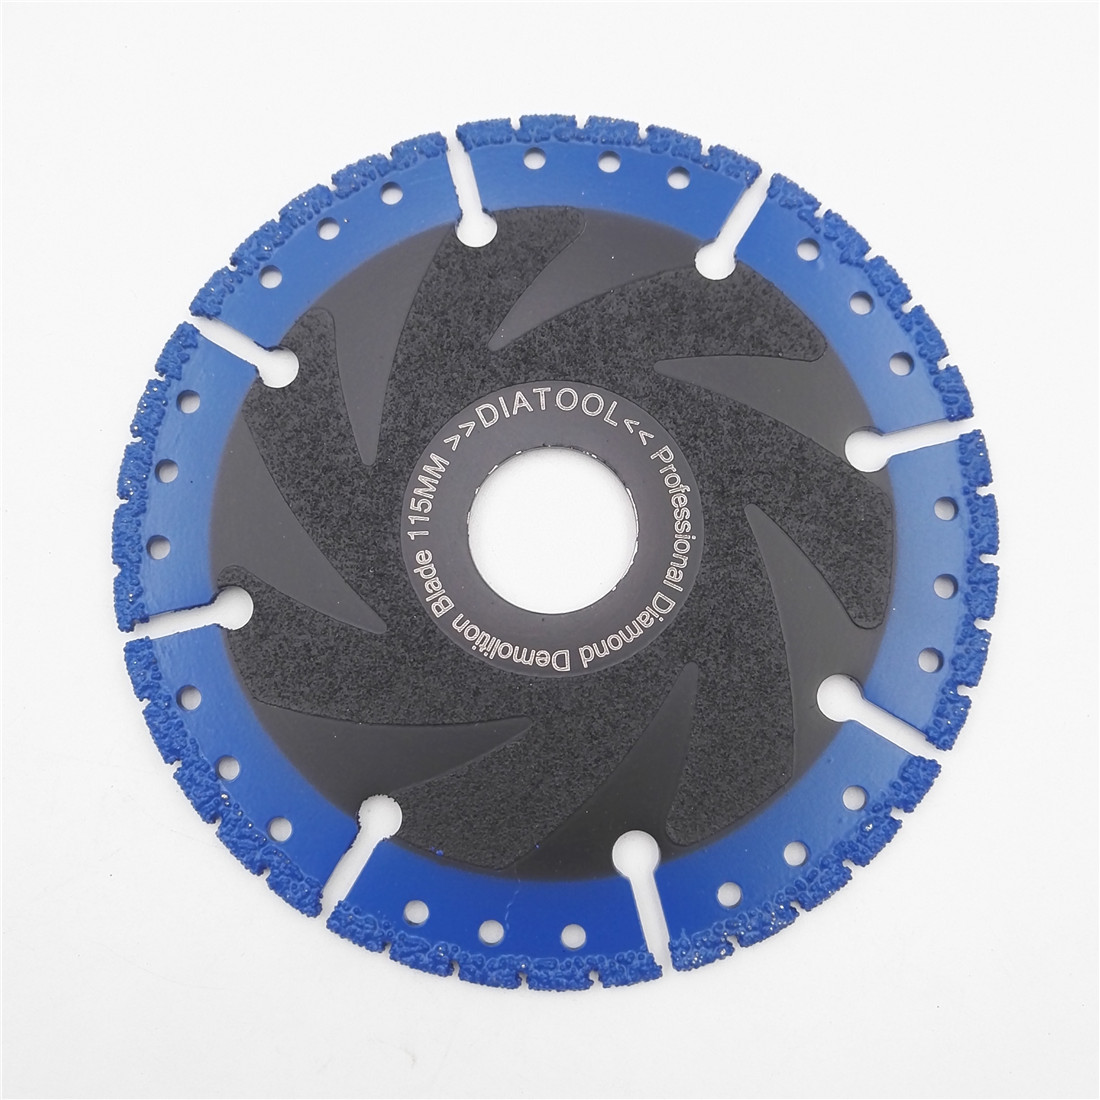 DIATOOL 1 stück Vakuum Gelötete Diamant klinge trennscheibe für multi Zweck Gusseisen Rebar Aluminium rettungs Diamant rad sah klinge